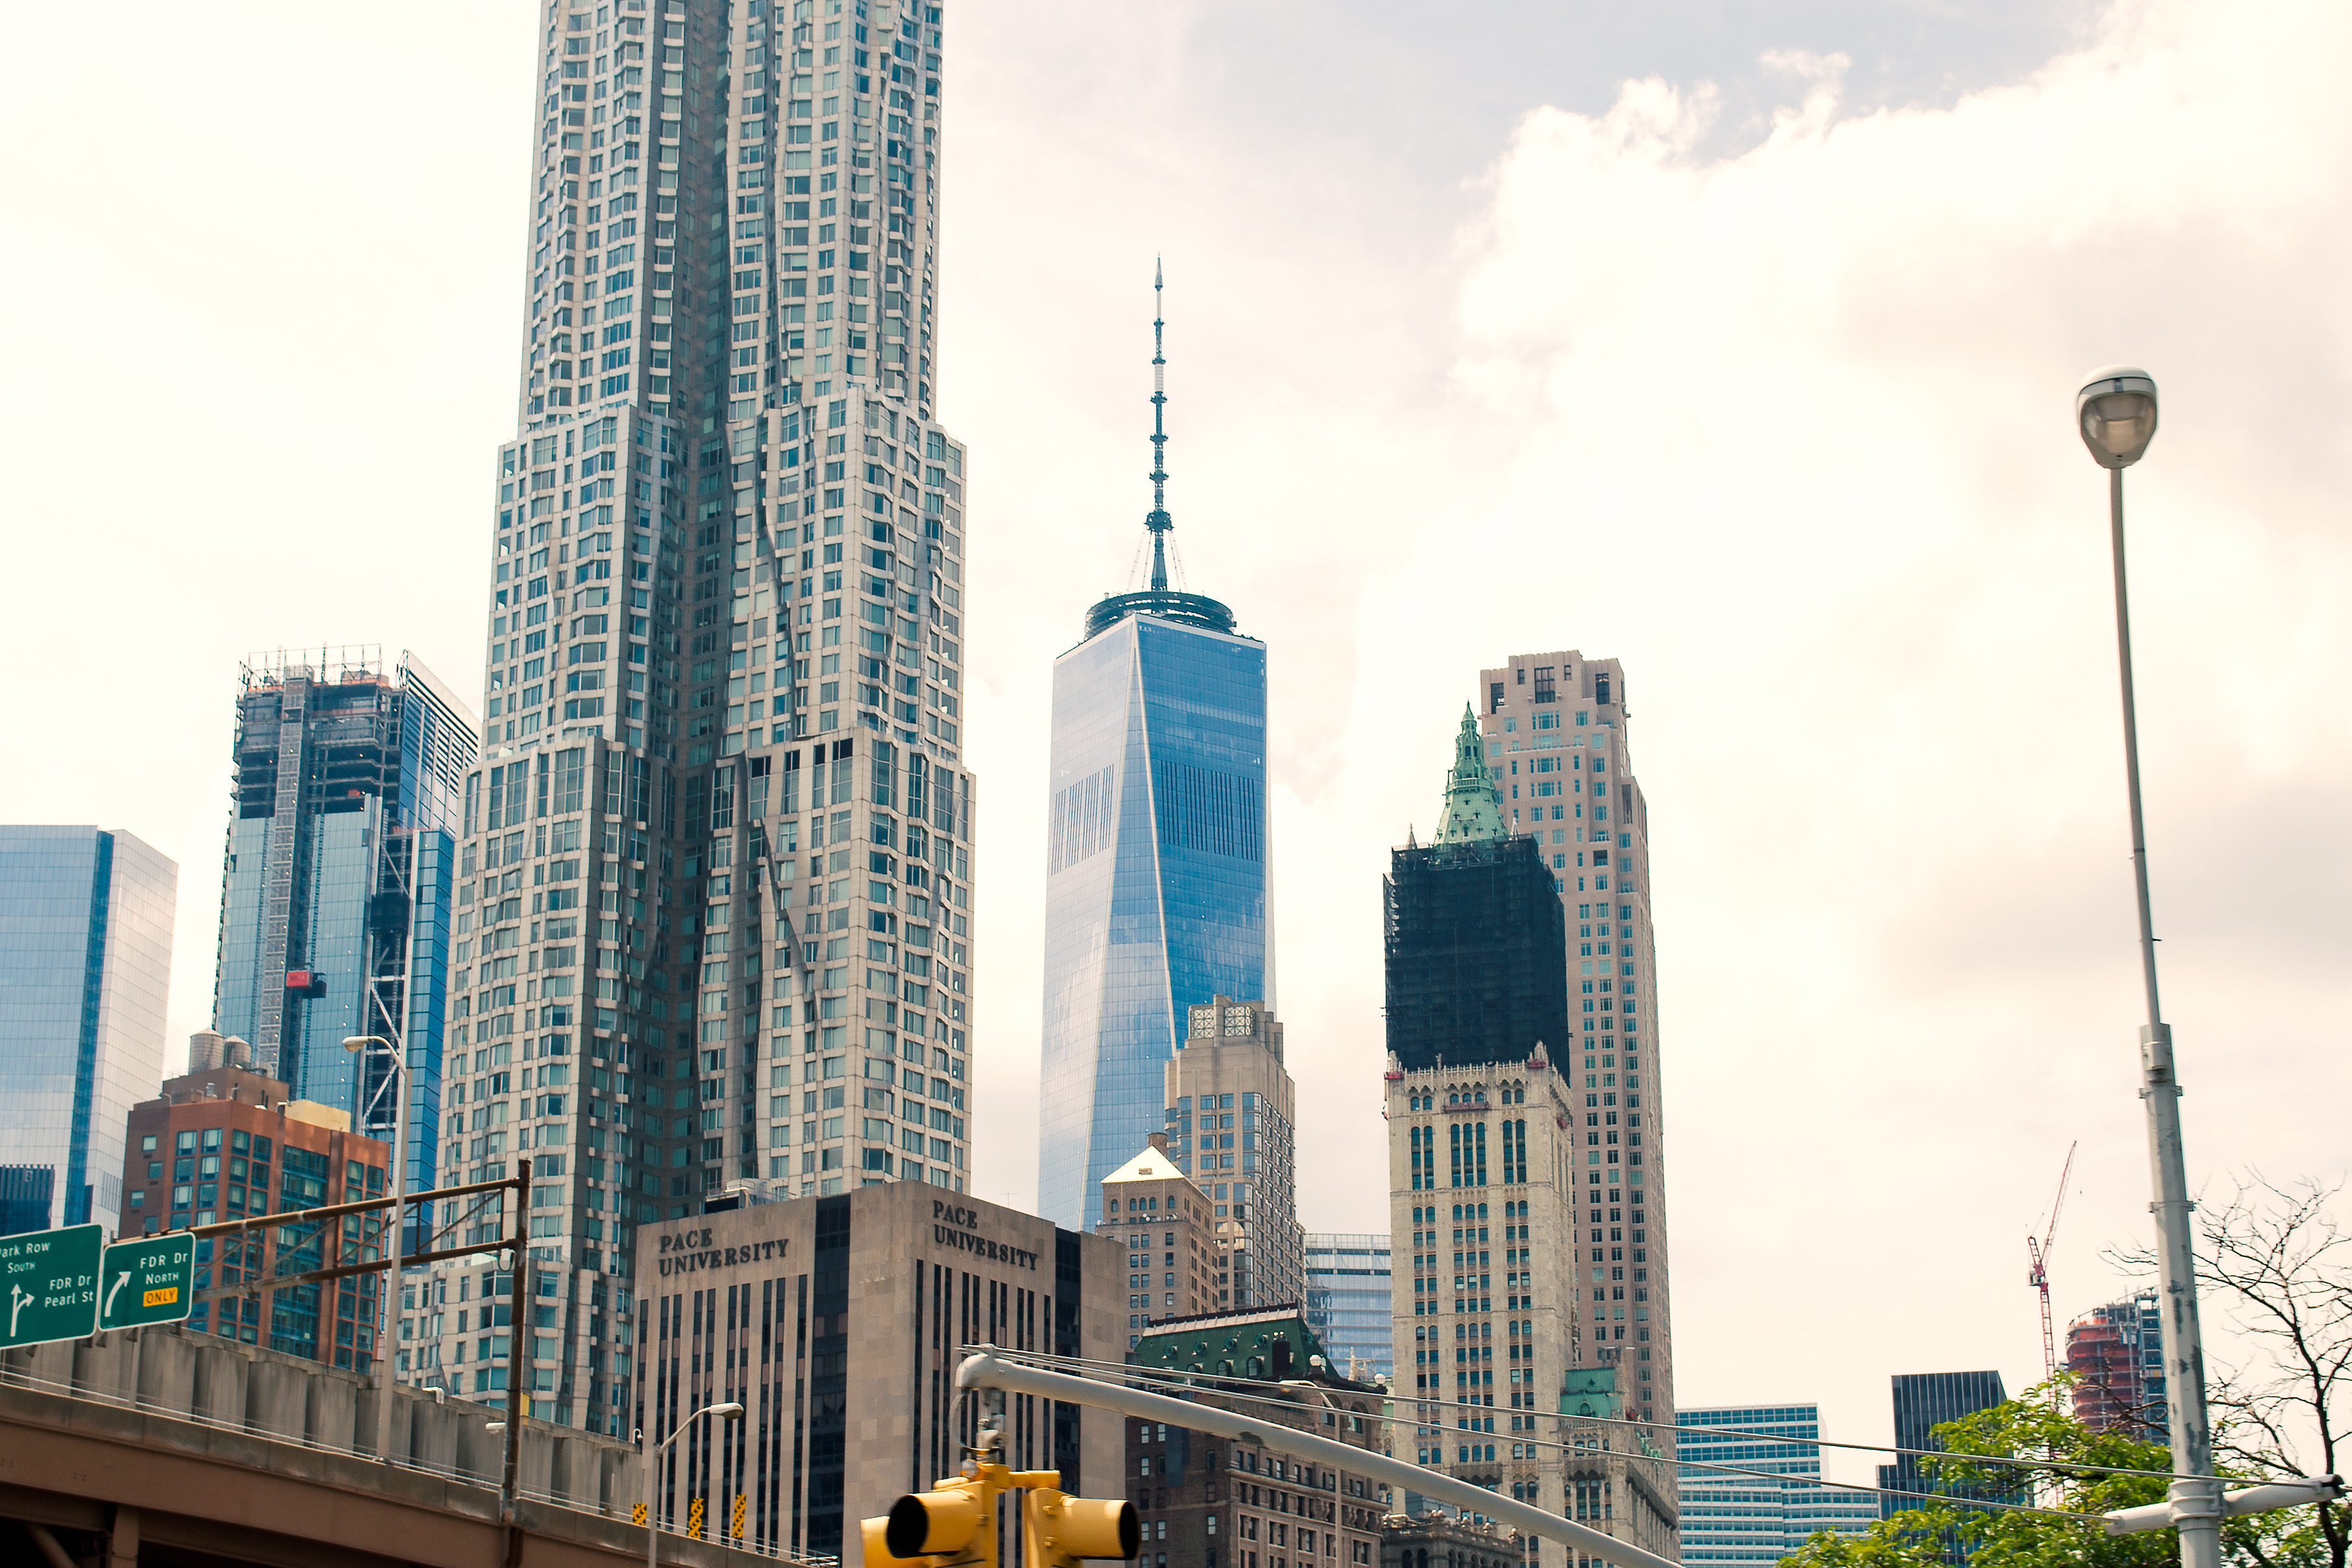 New York, New York 02